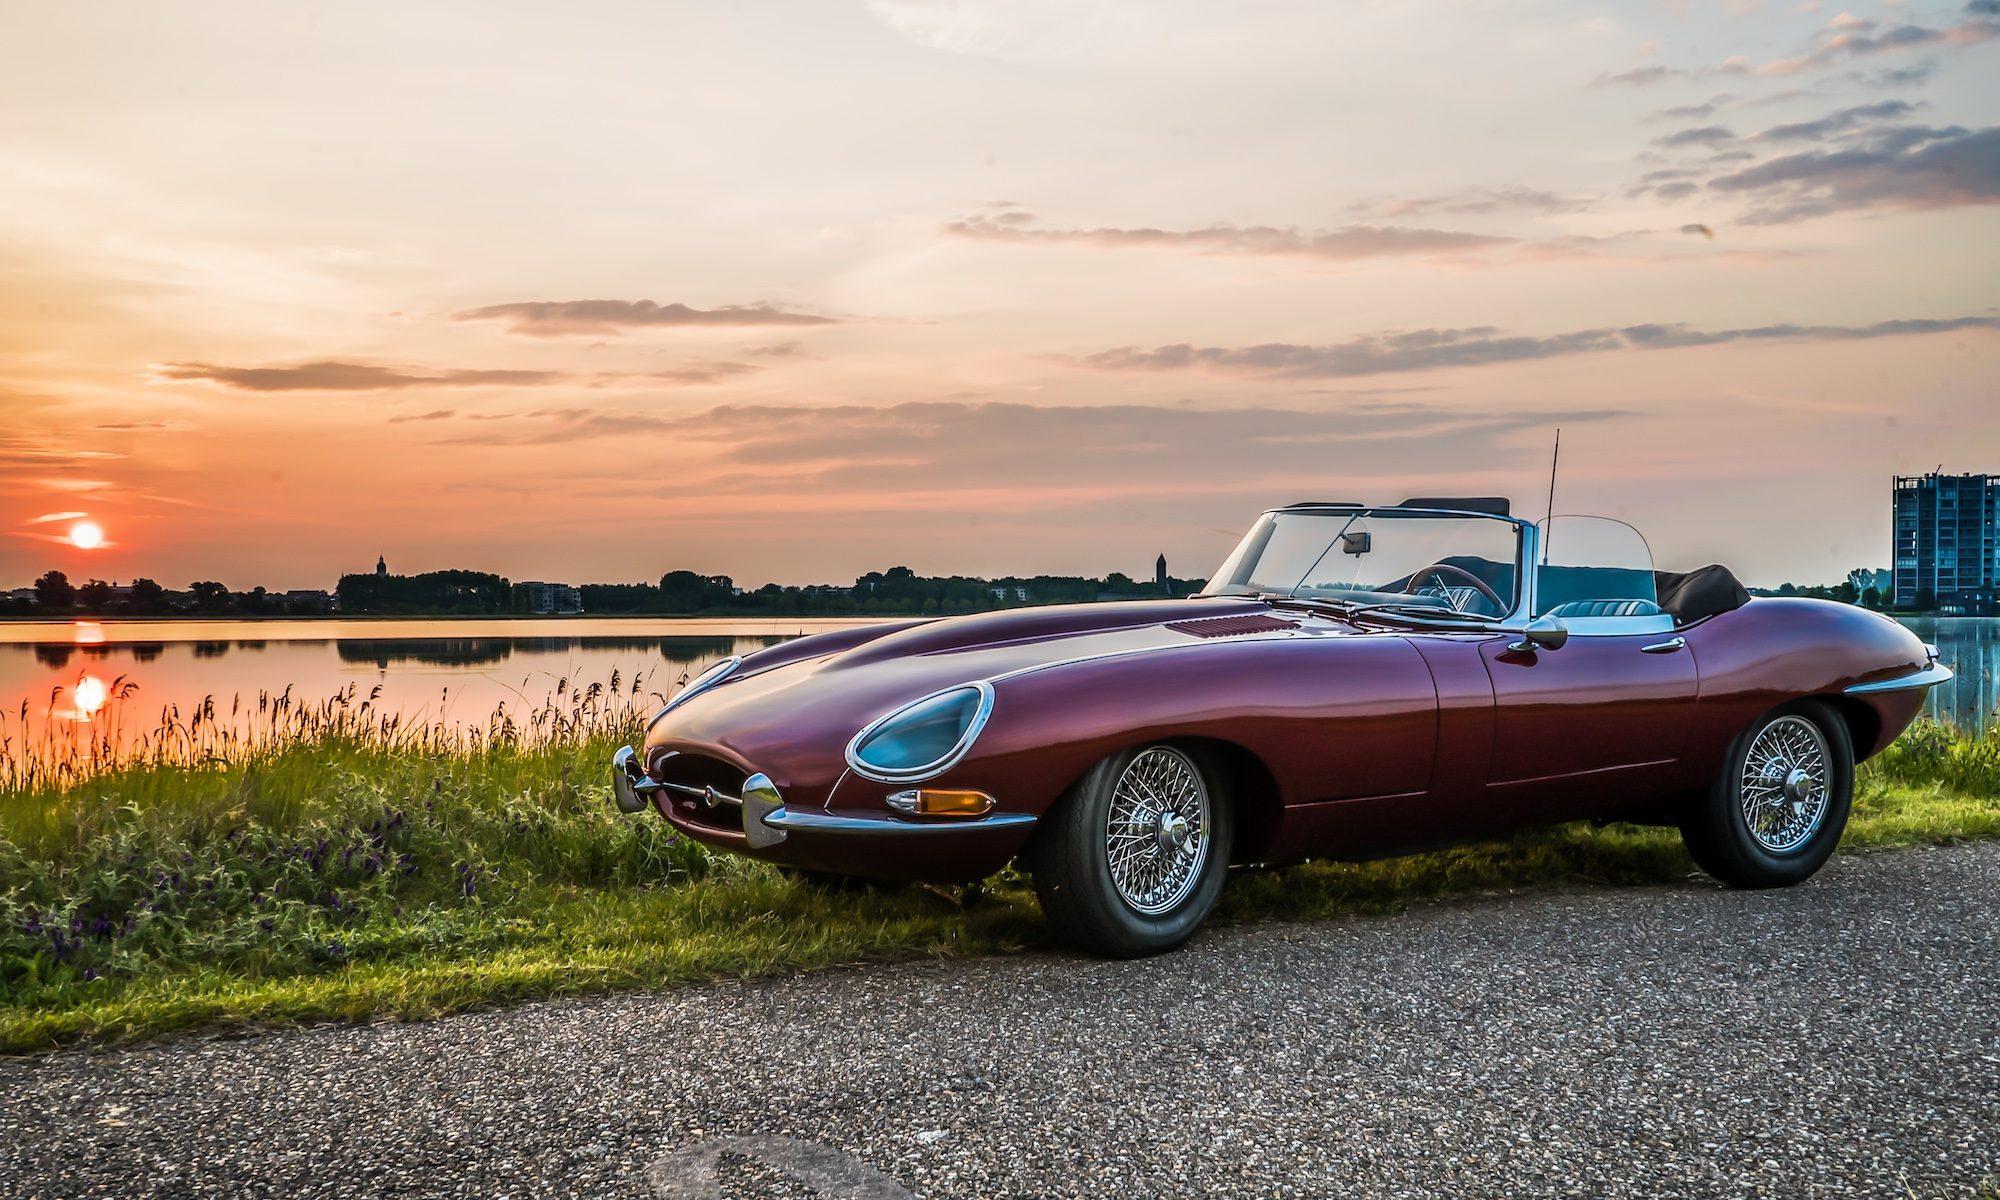 Bram's Classic Cars